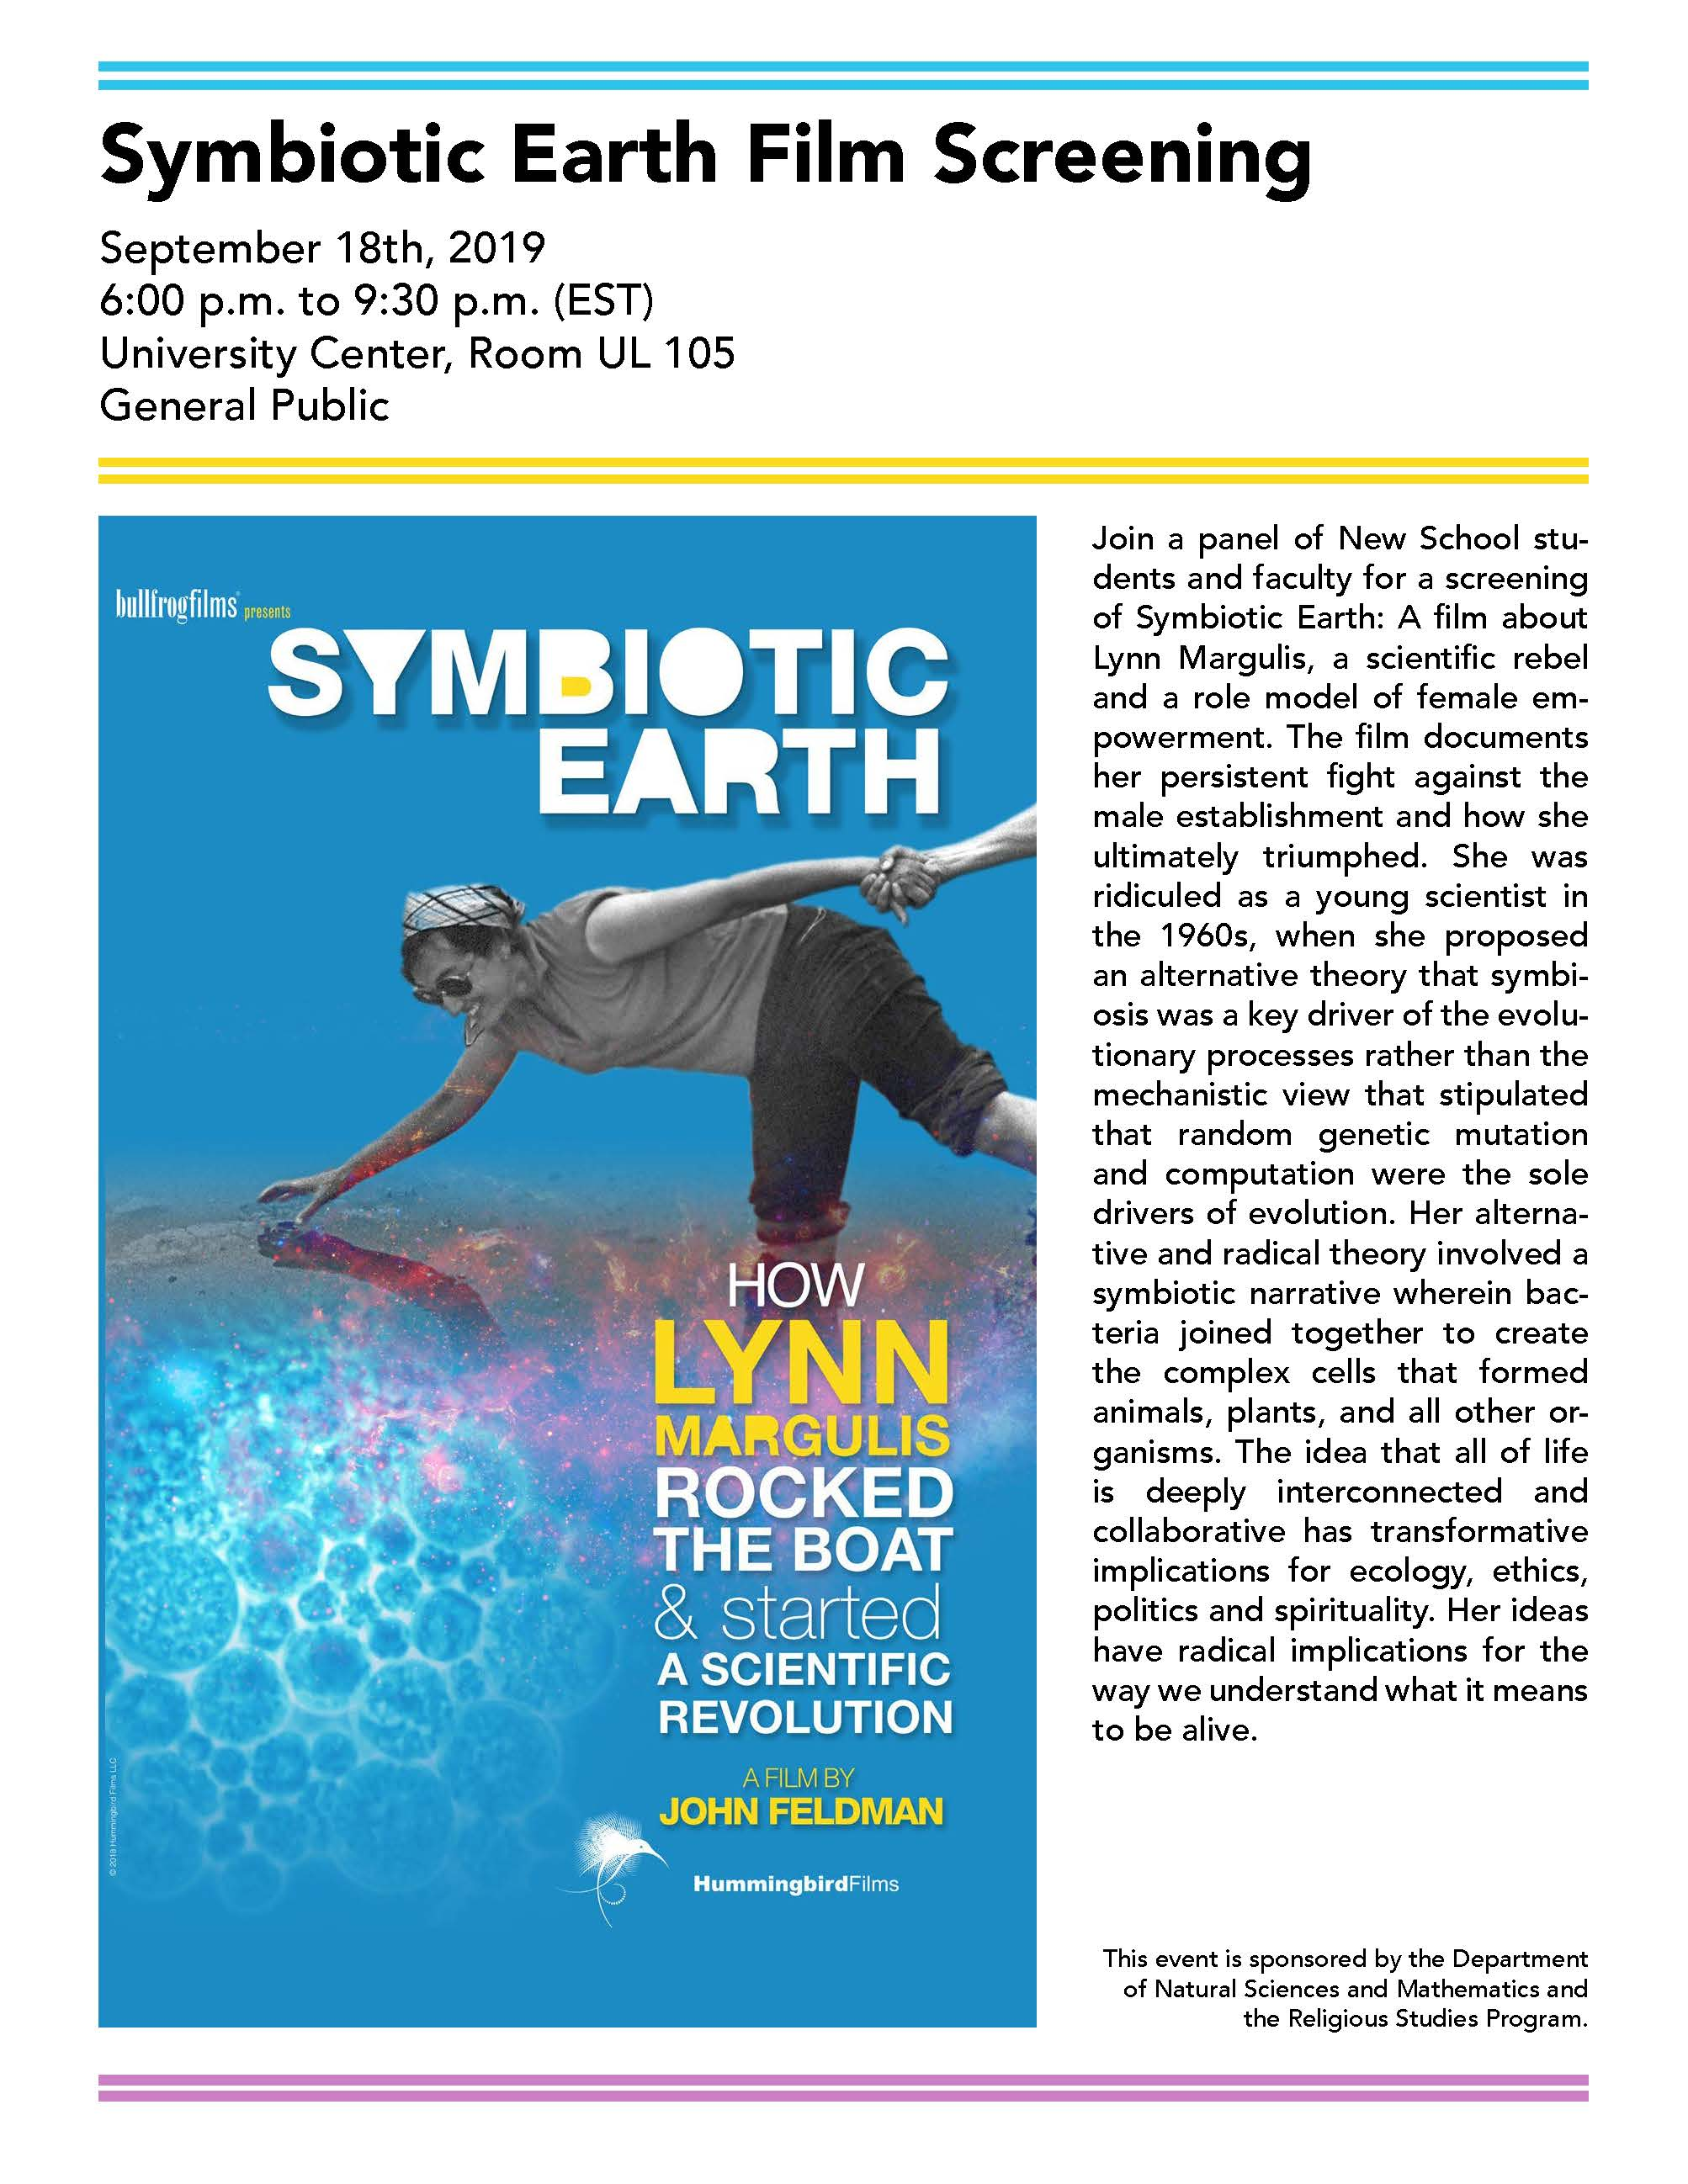 Symbiotic Earth Poster.jpg